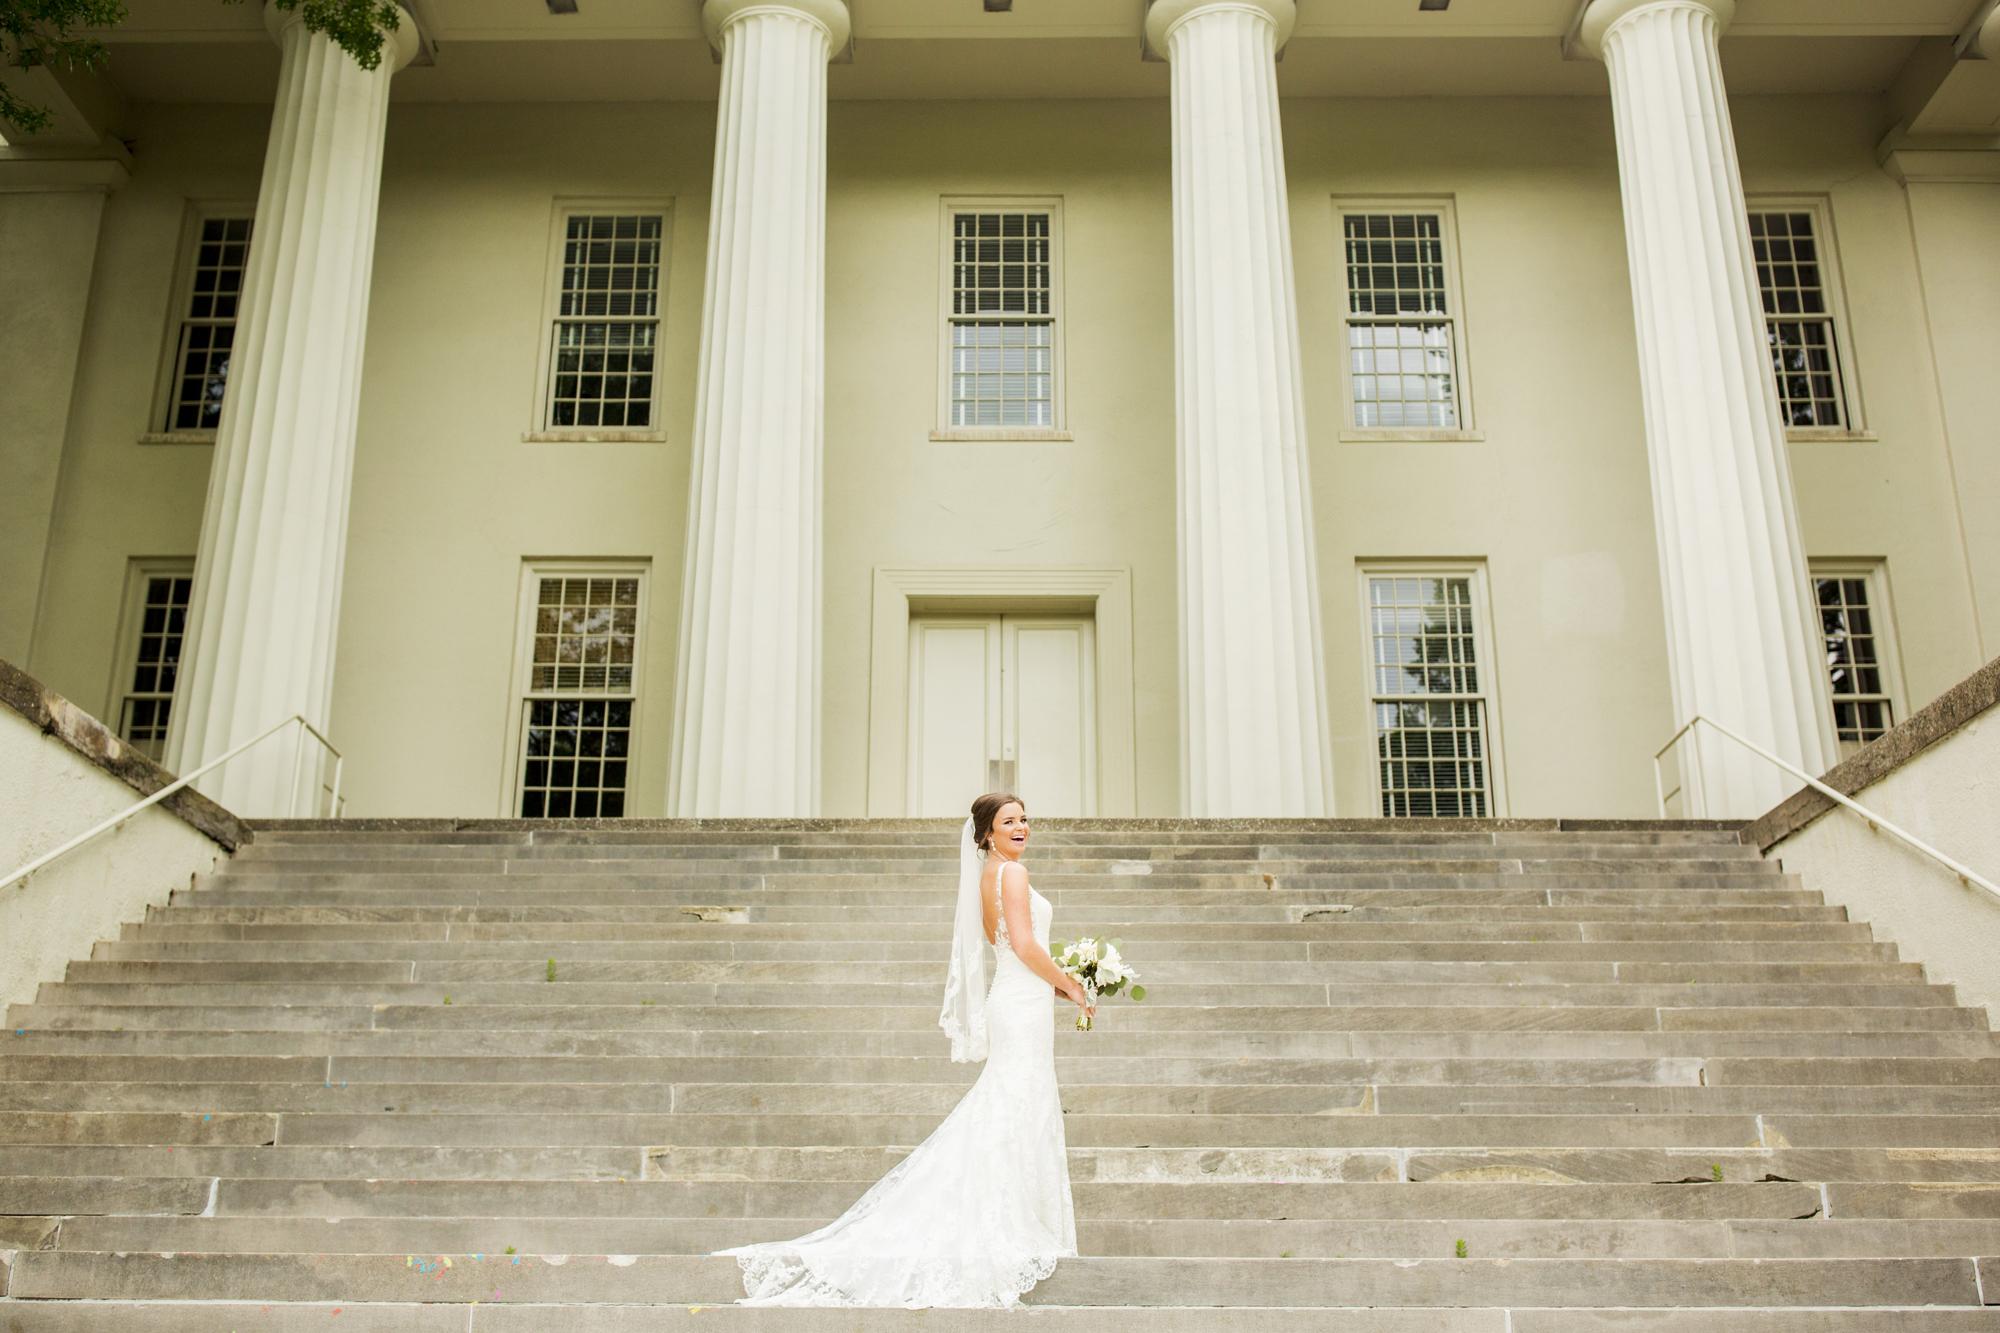 Seriously_Sabrina_Photography_Lexington _Kentucky_Limestone_Hall_Wedding_Rogers48.jpg